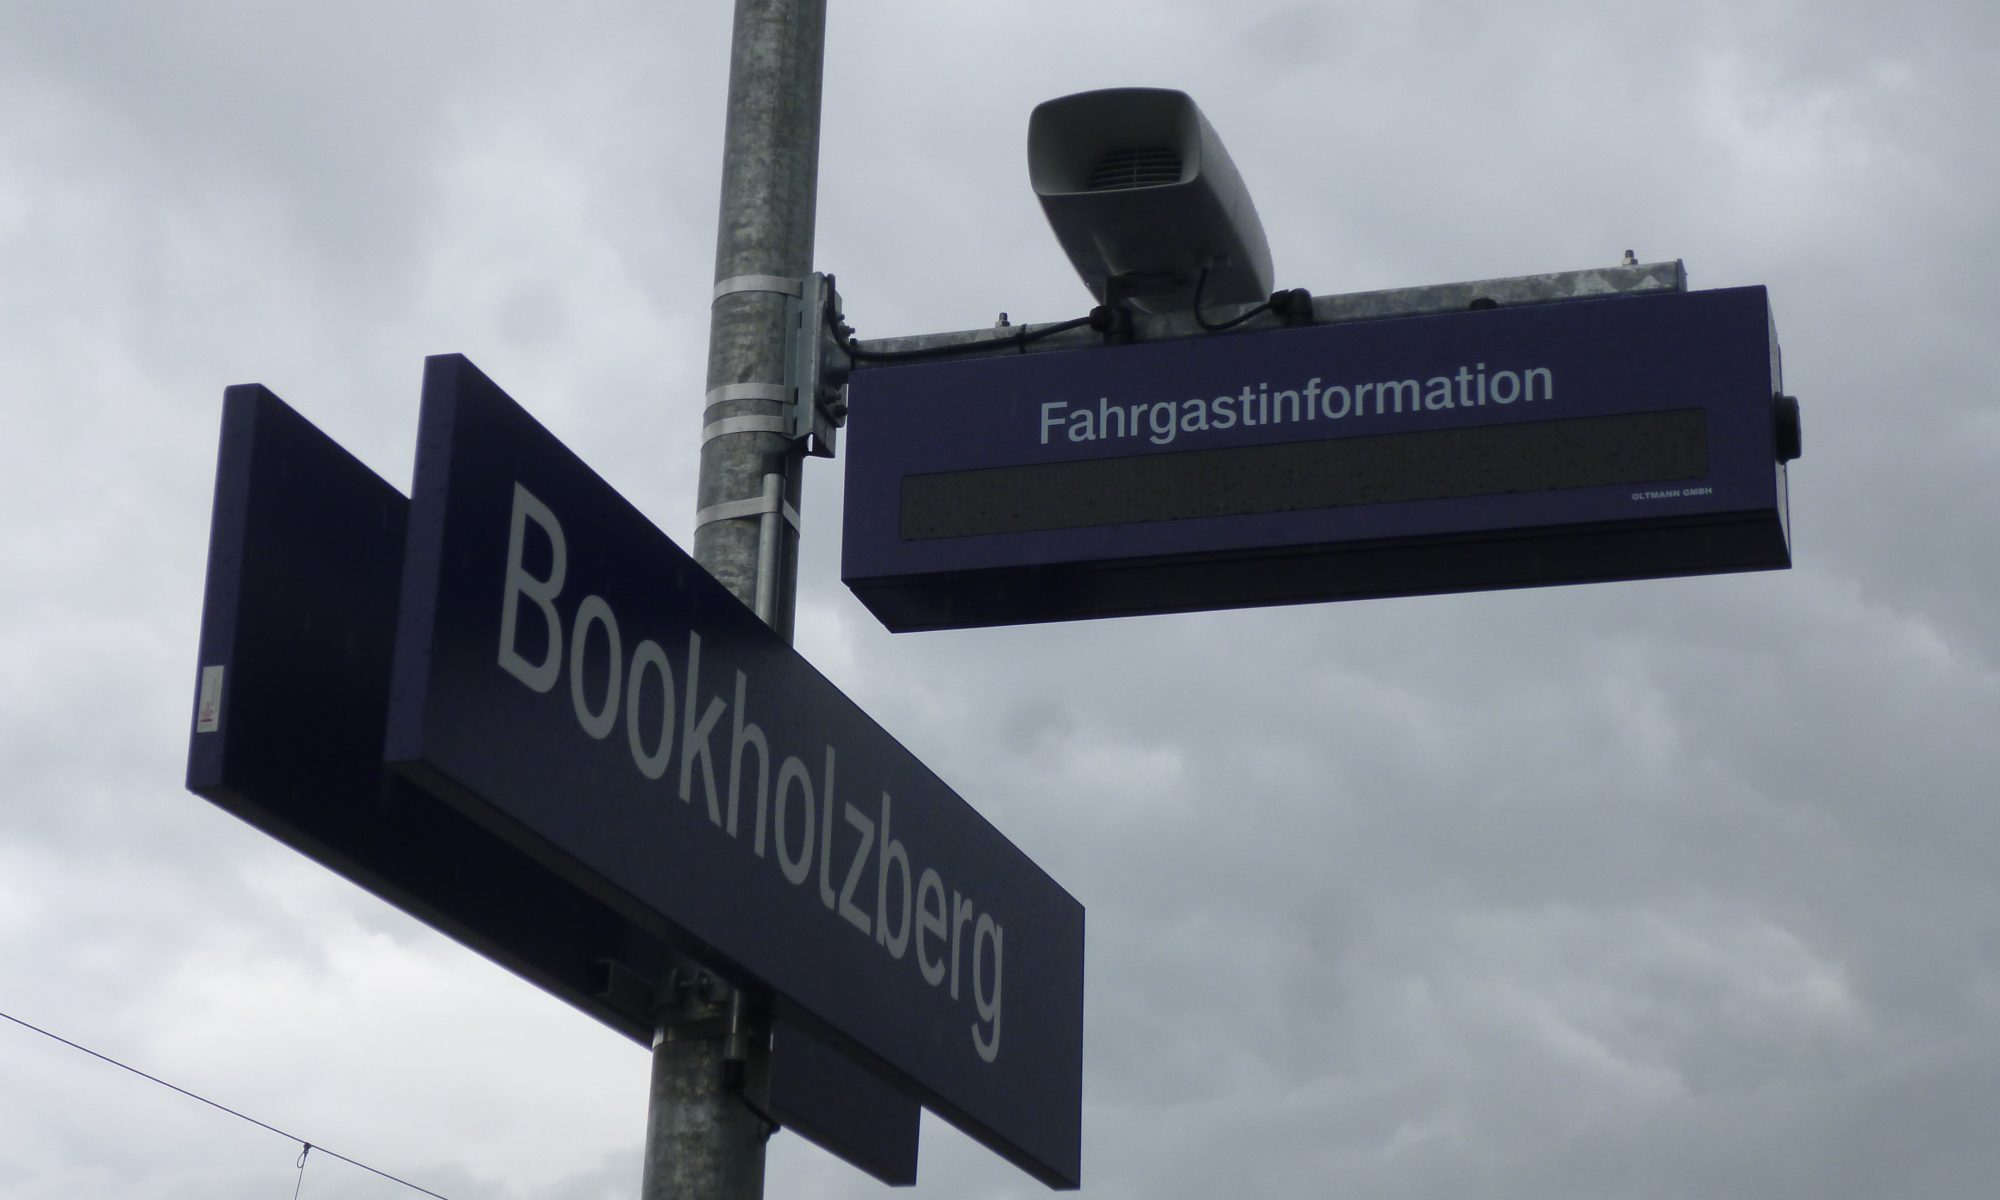 Bahnhof Bookholzberg Anzeige